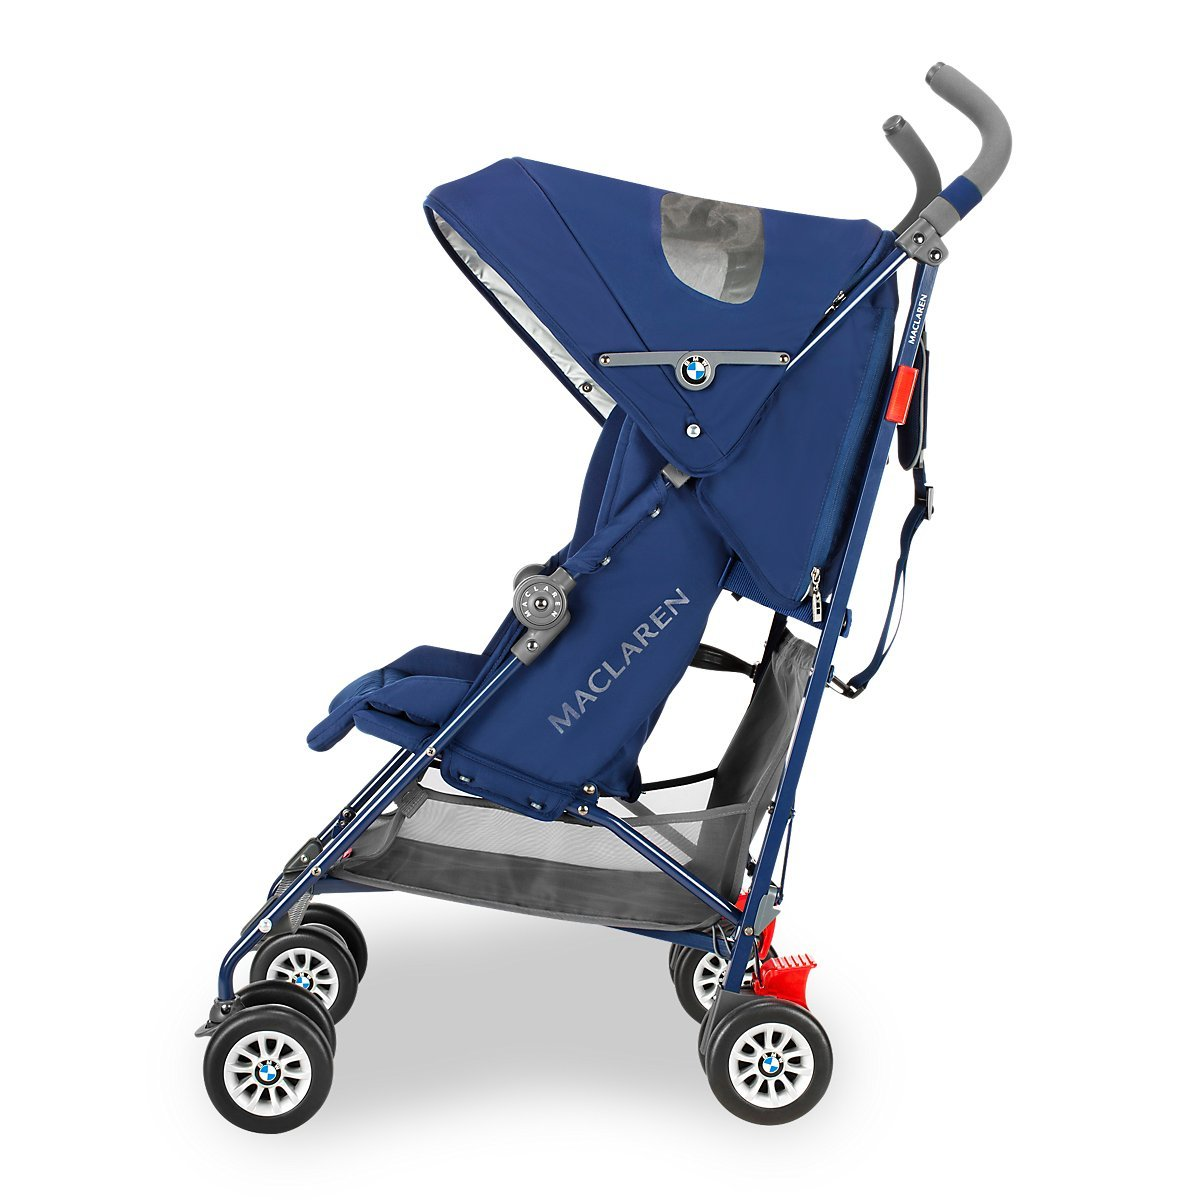 Amazon.com: Maclaren BMW Buggy carriola, Marino: Baby